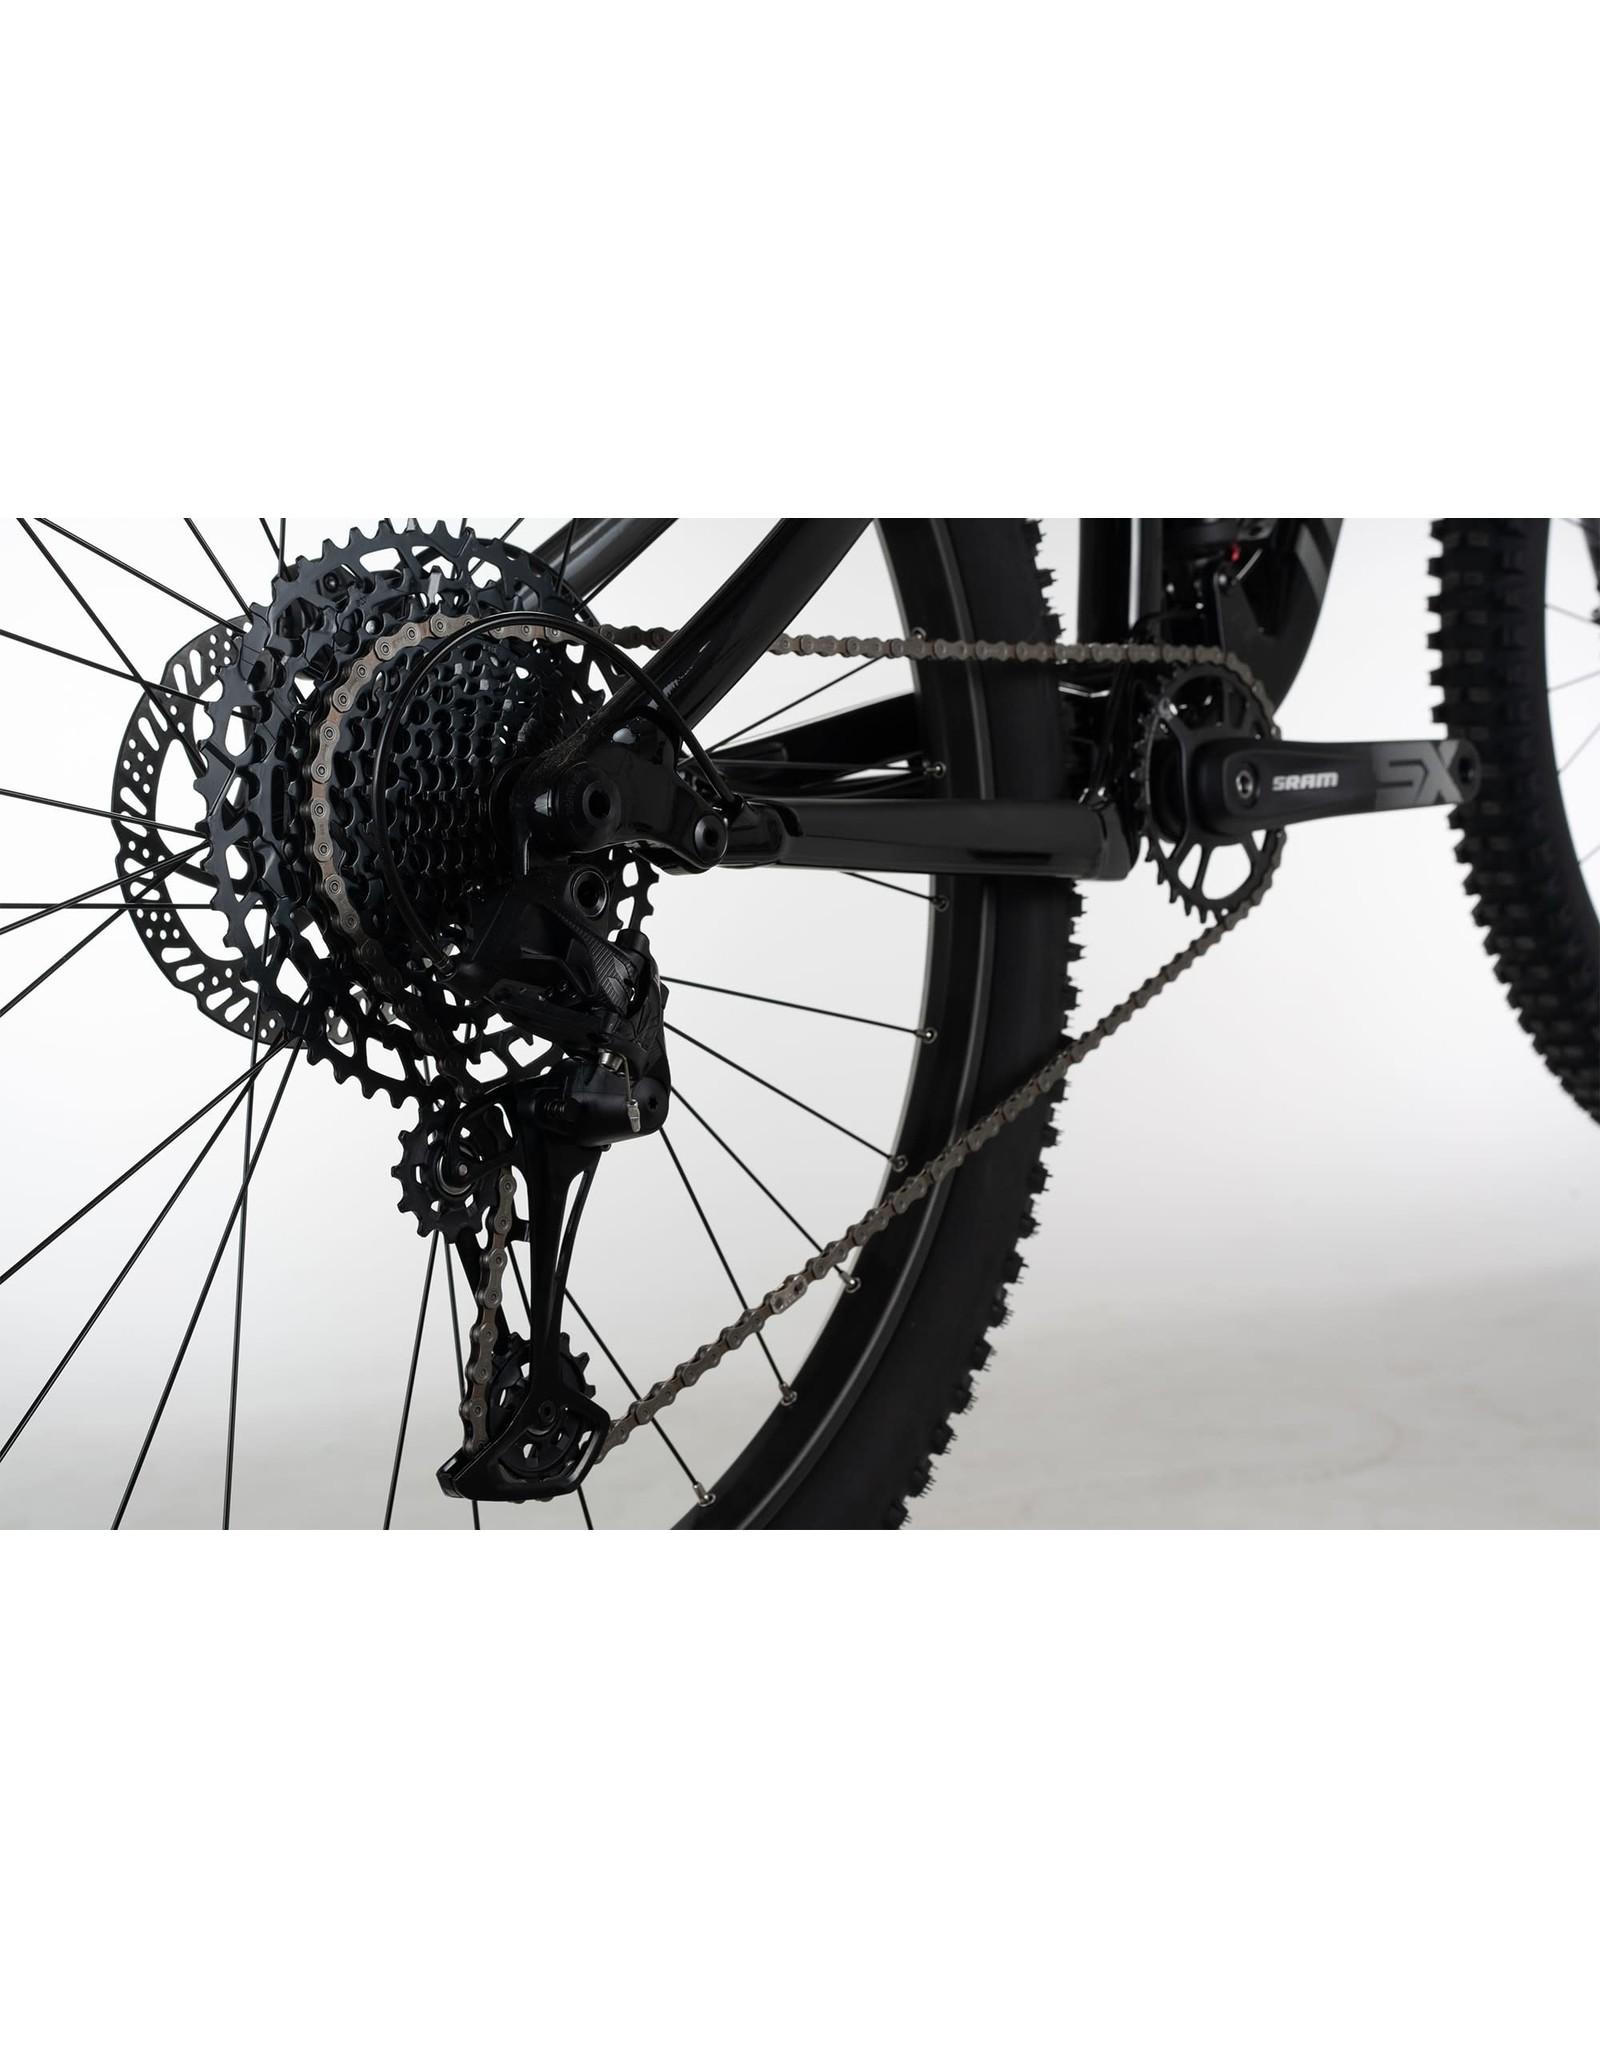 NORCO Bikes FLUID FS 3 L29 BLACK/CHARCOAL